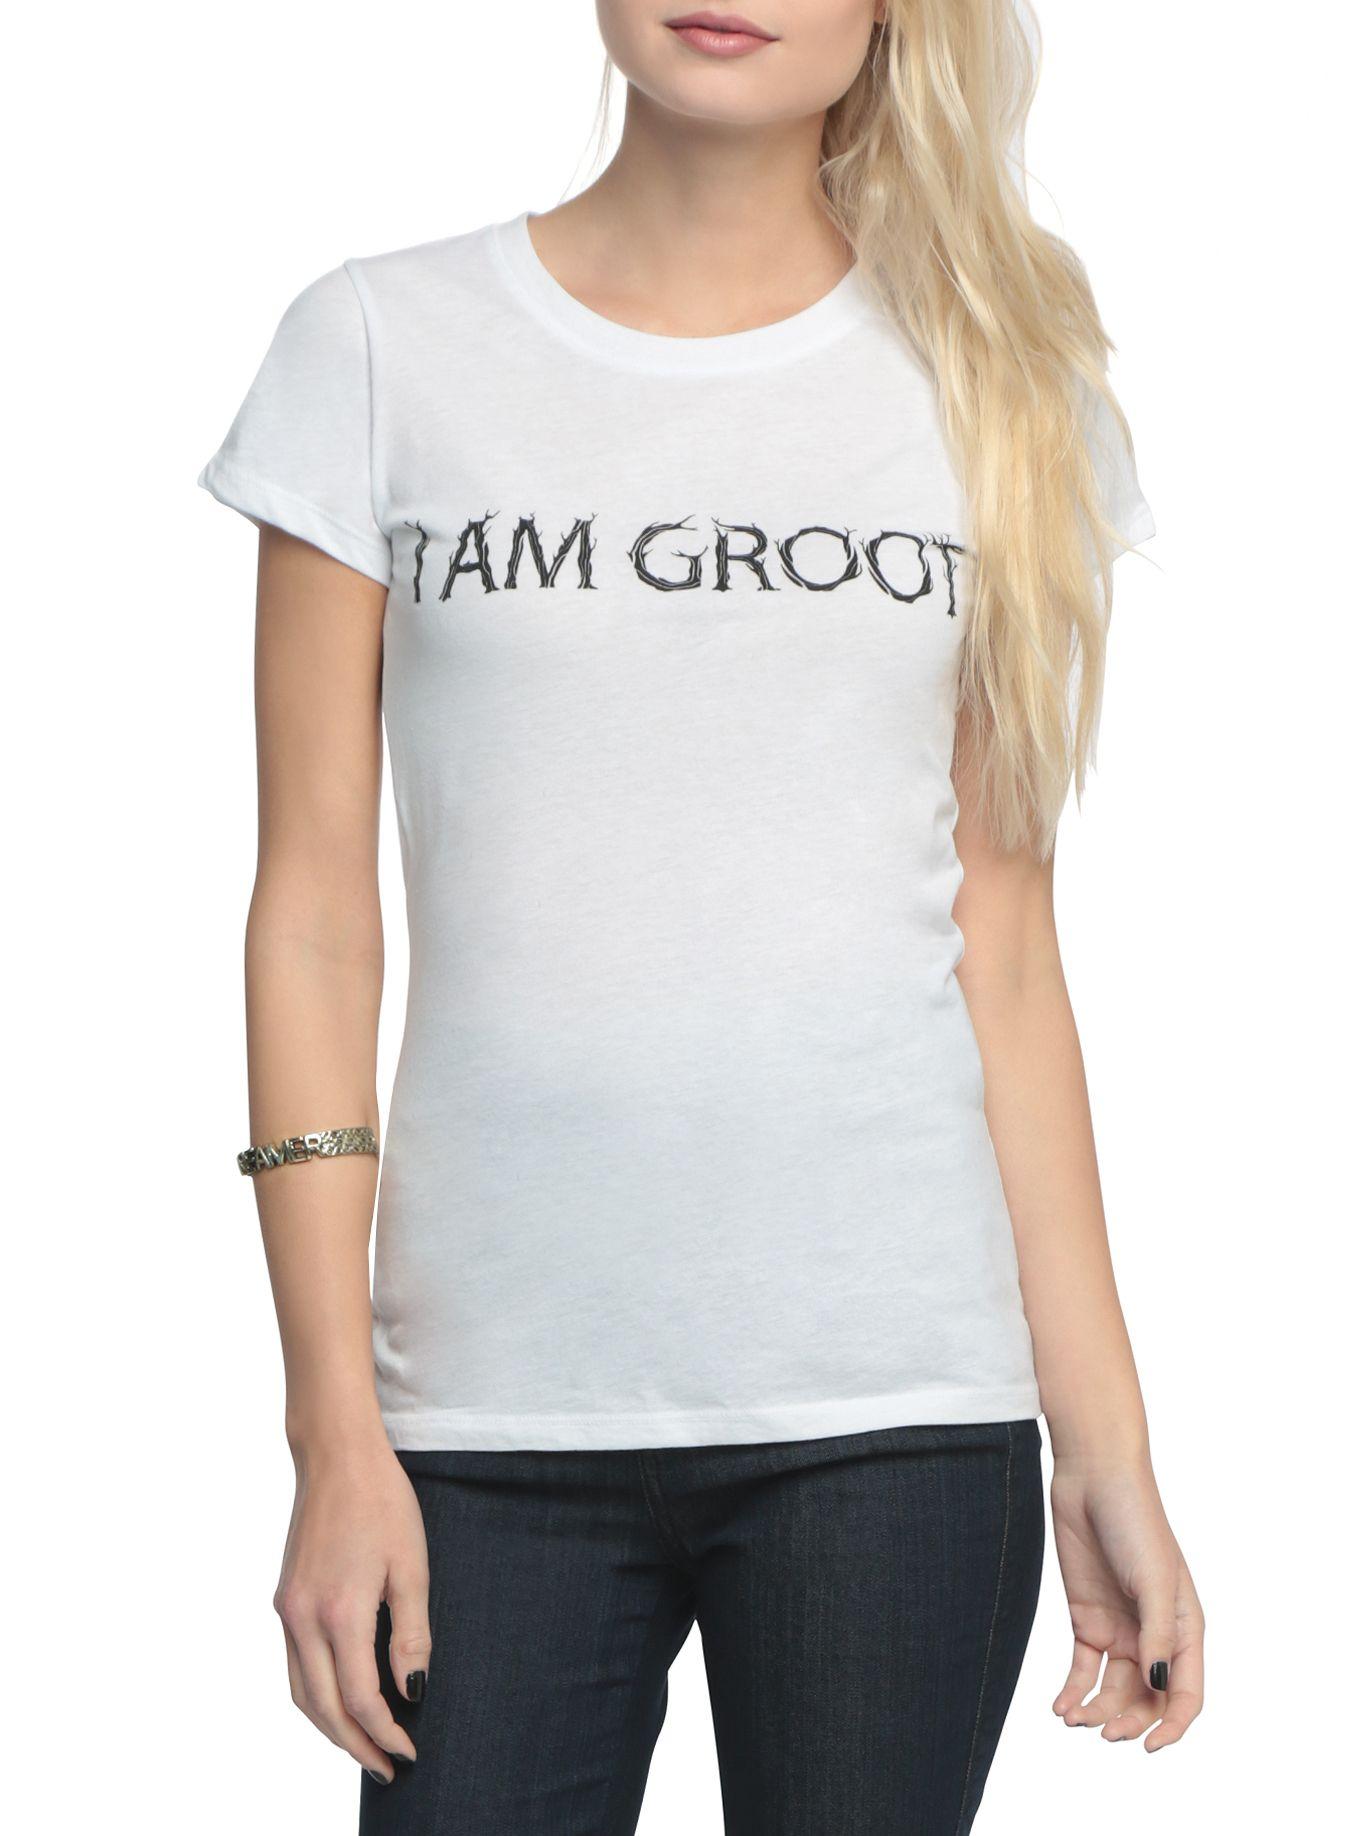 Black widow t shirt hot topic - Marvel Guardians Of The Galaxy I Am Groot Girls T Shirt Hot Topic